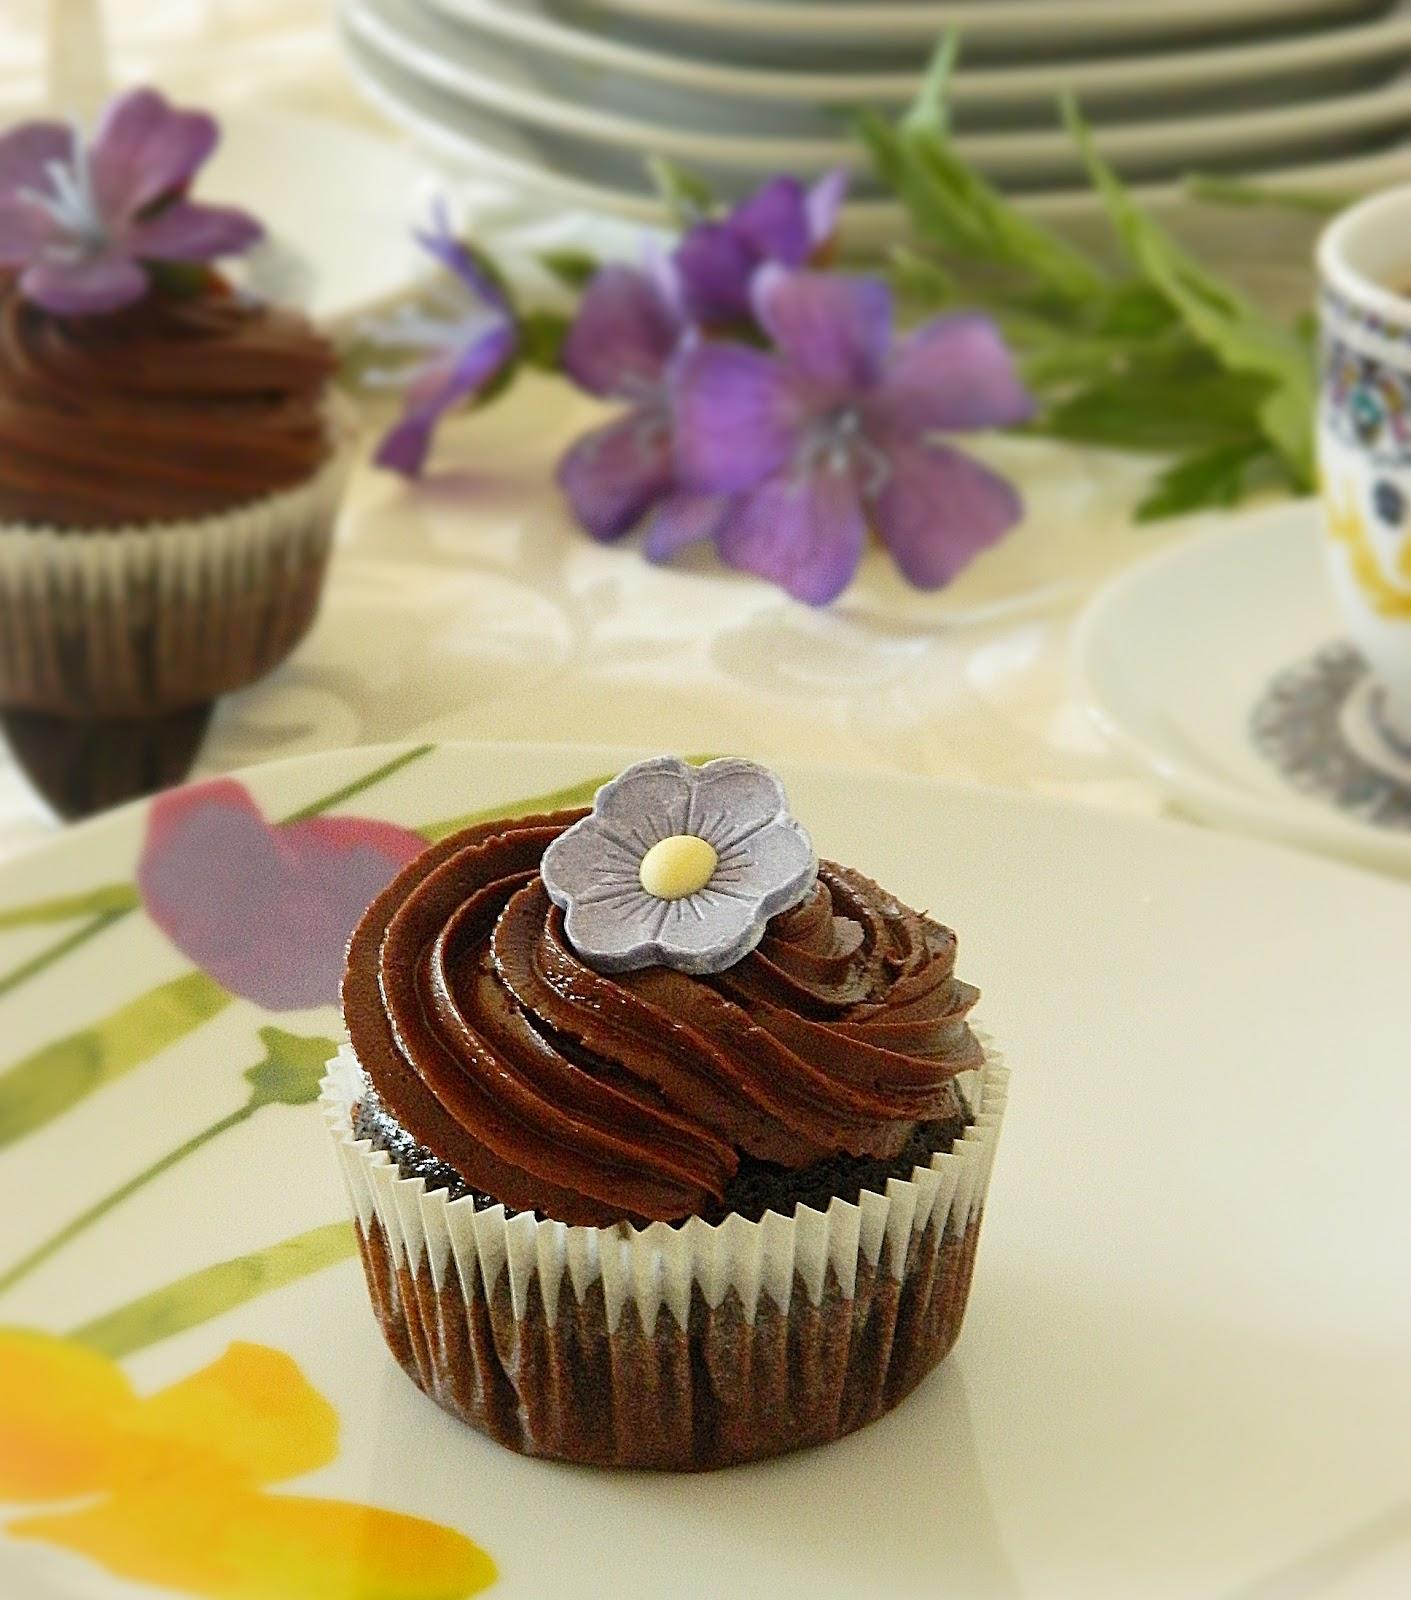 dr ola 39 s kitchen chocolate cupcakes with chocolate ganache frosting schokoladen muffins mit. Black Bedroom Furniture Sets. Home Design Ideas